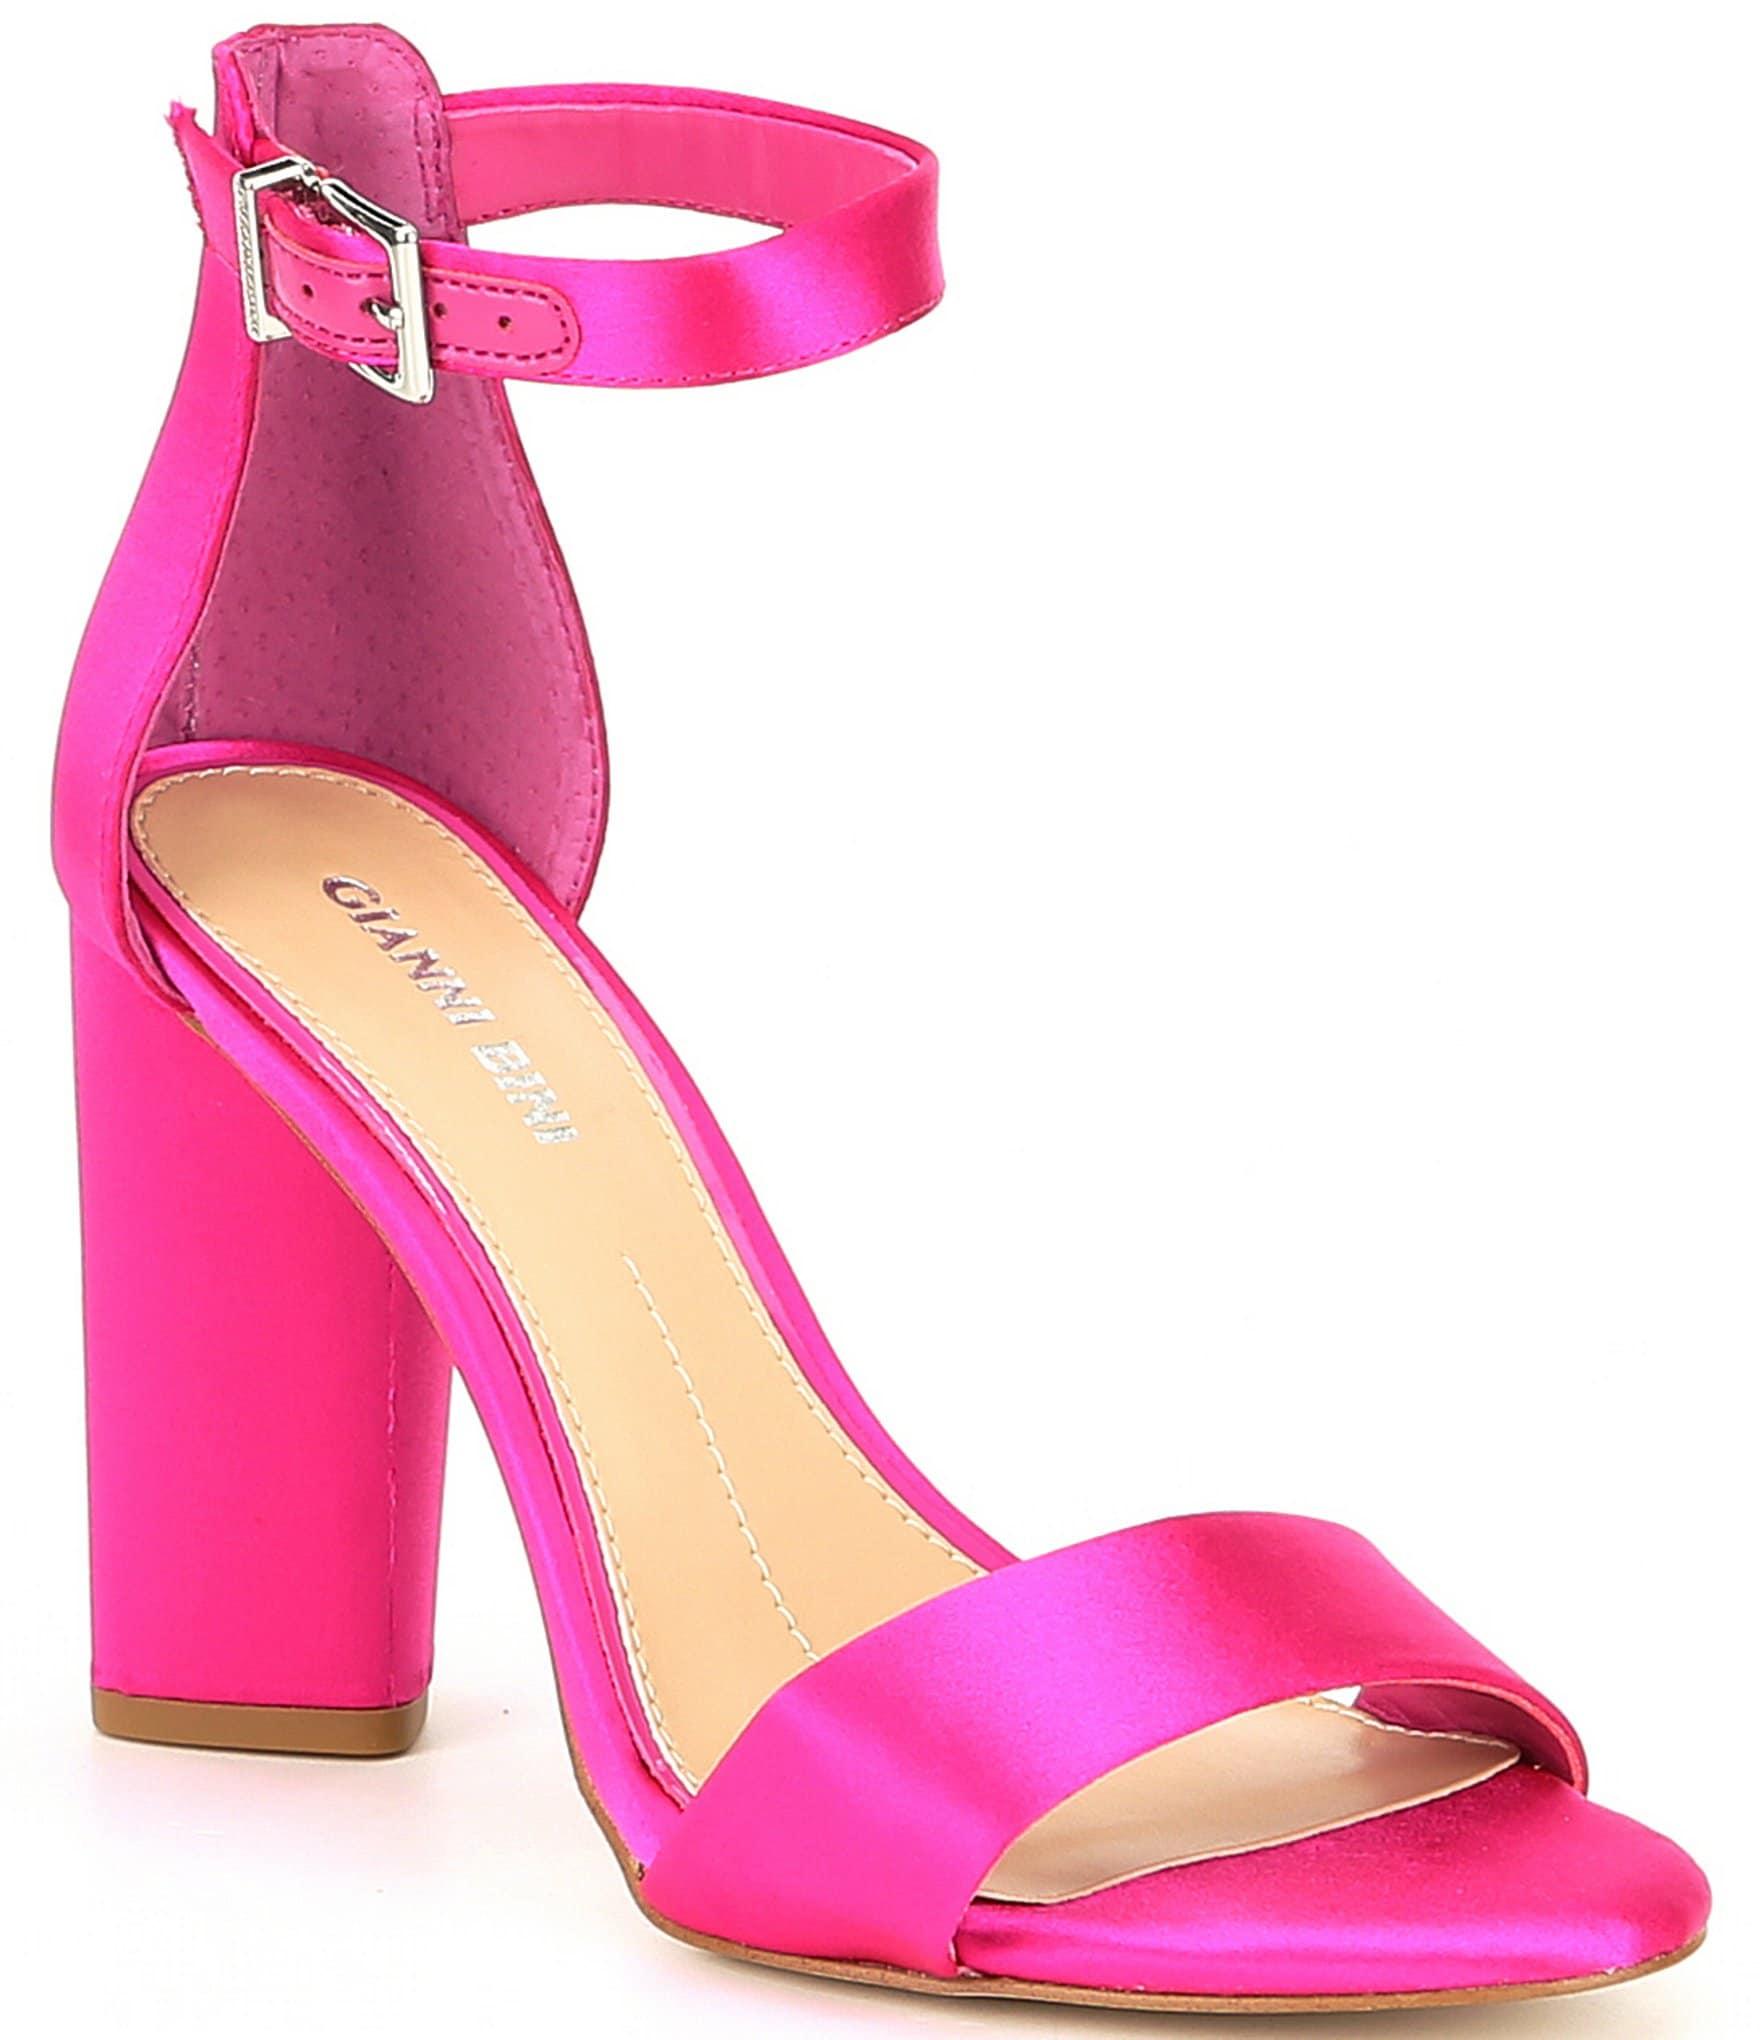 12e174b3cc61 block heel sandals  Shoes for Women